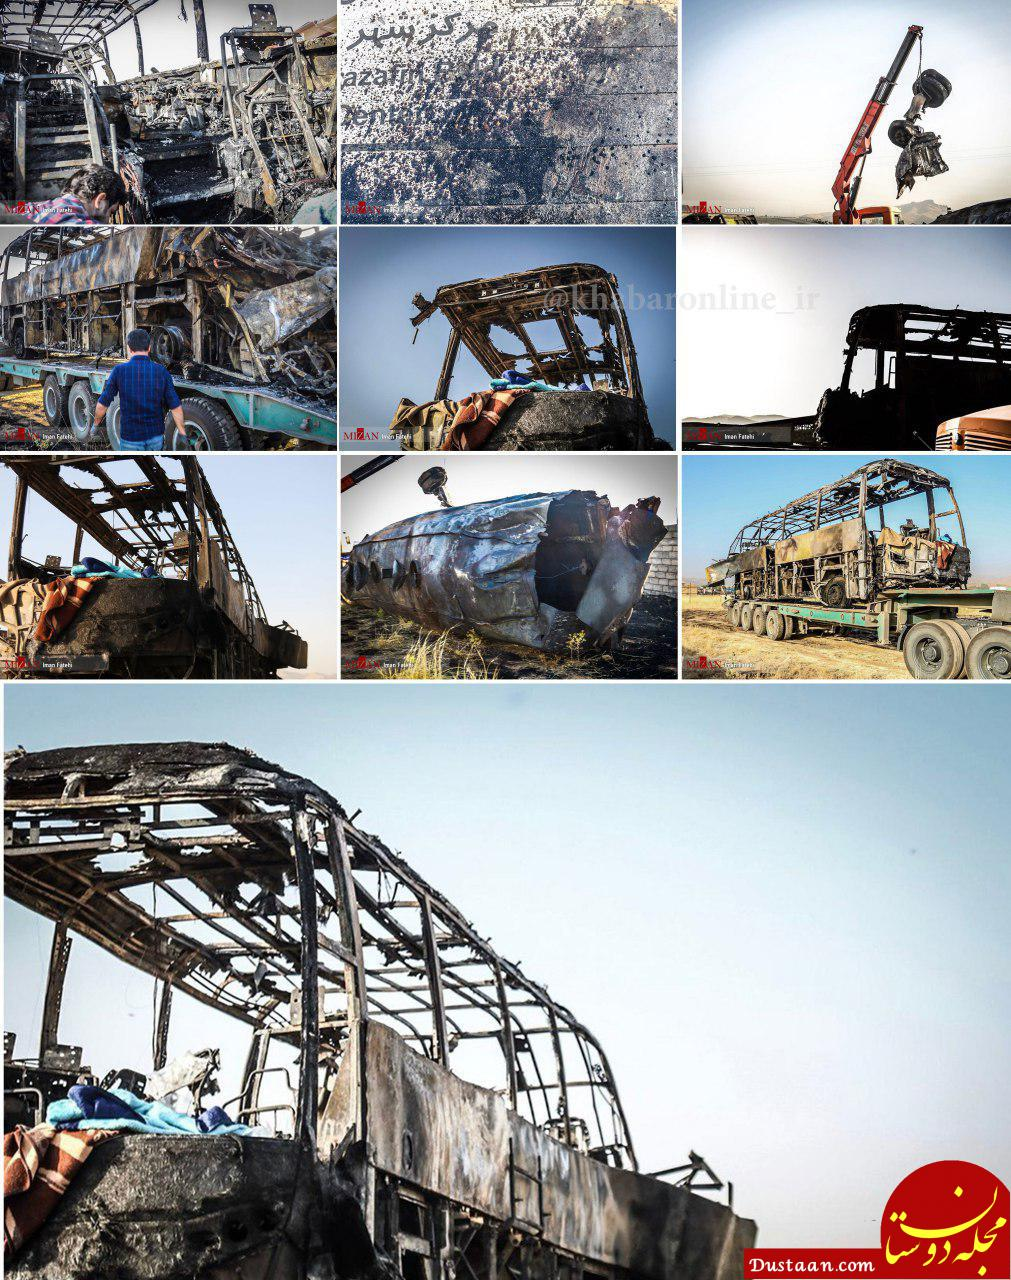 www.dustaan.com تصاویر دردناک از تصادف اتوبوس و تانکر سوخت در سنندج